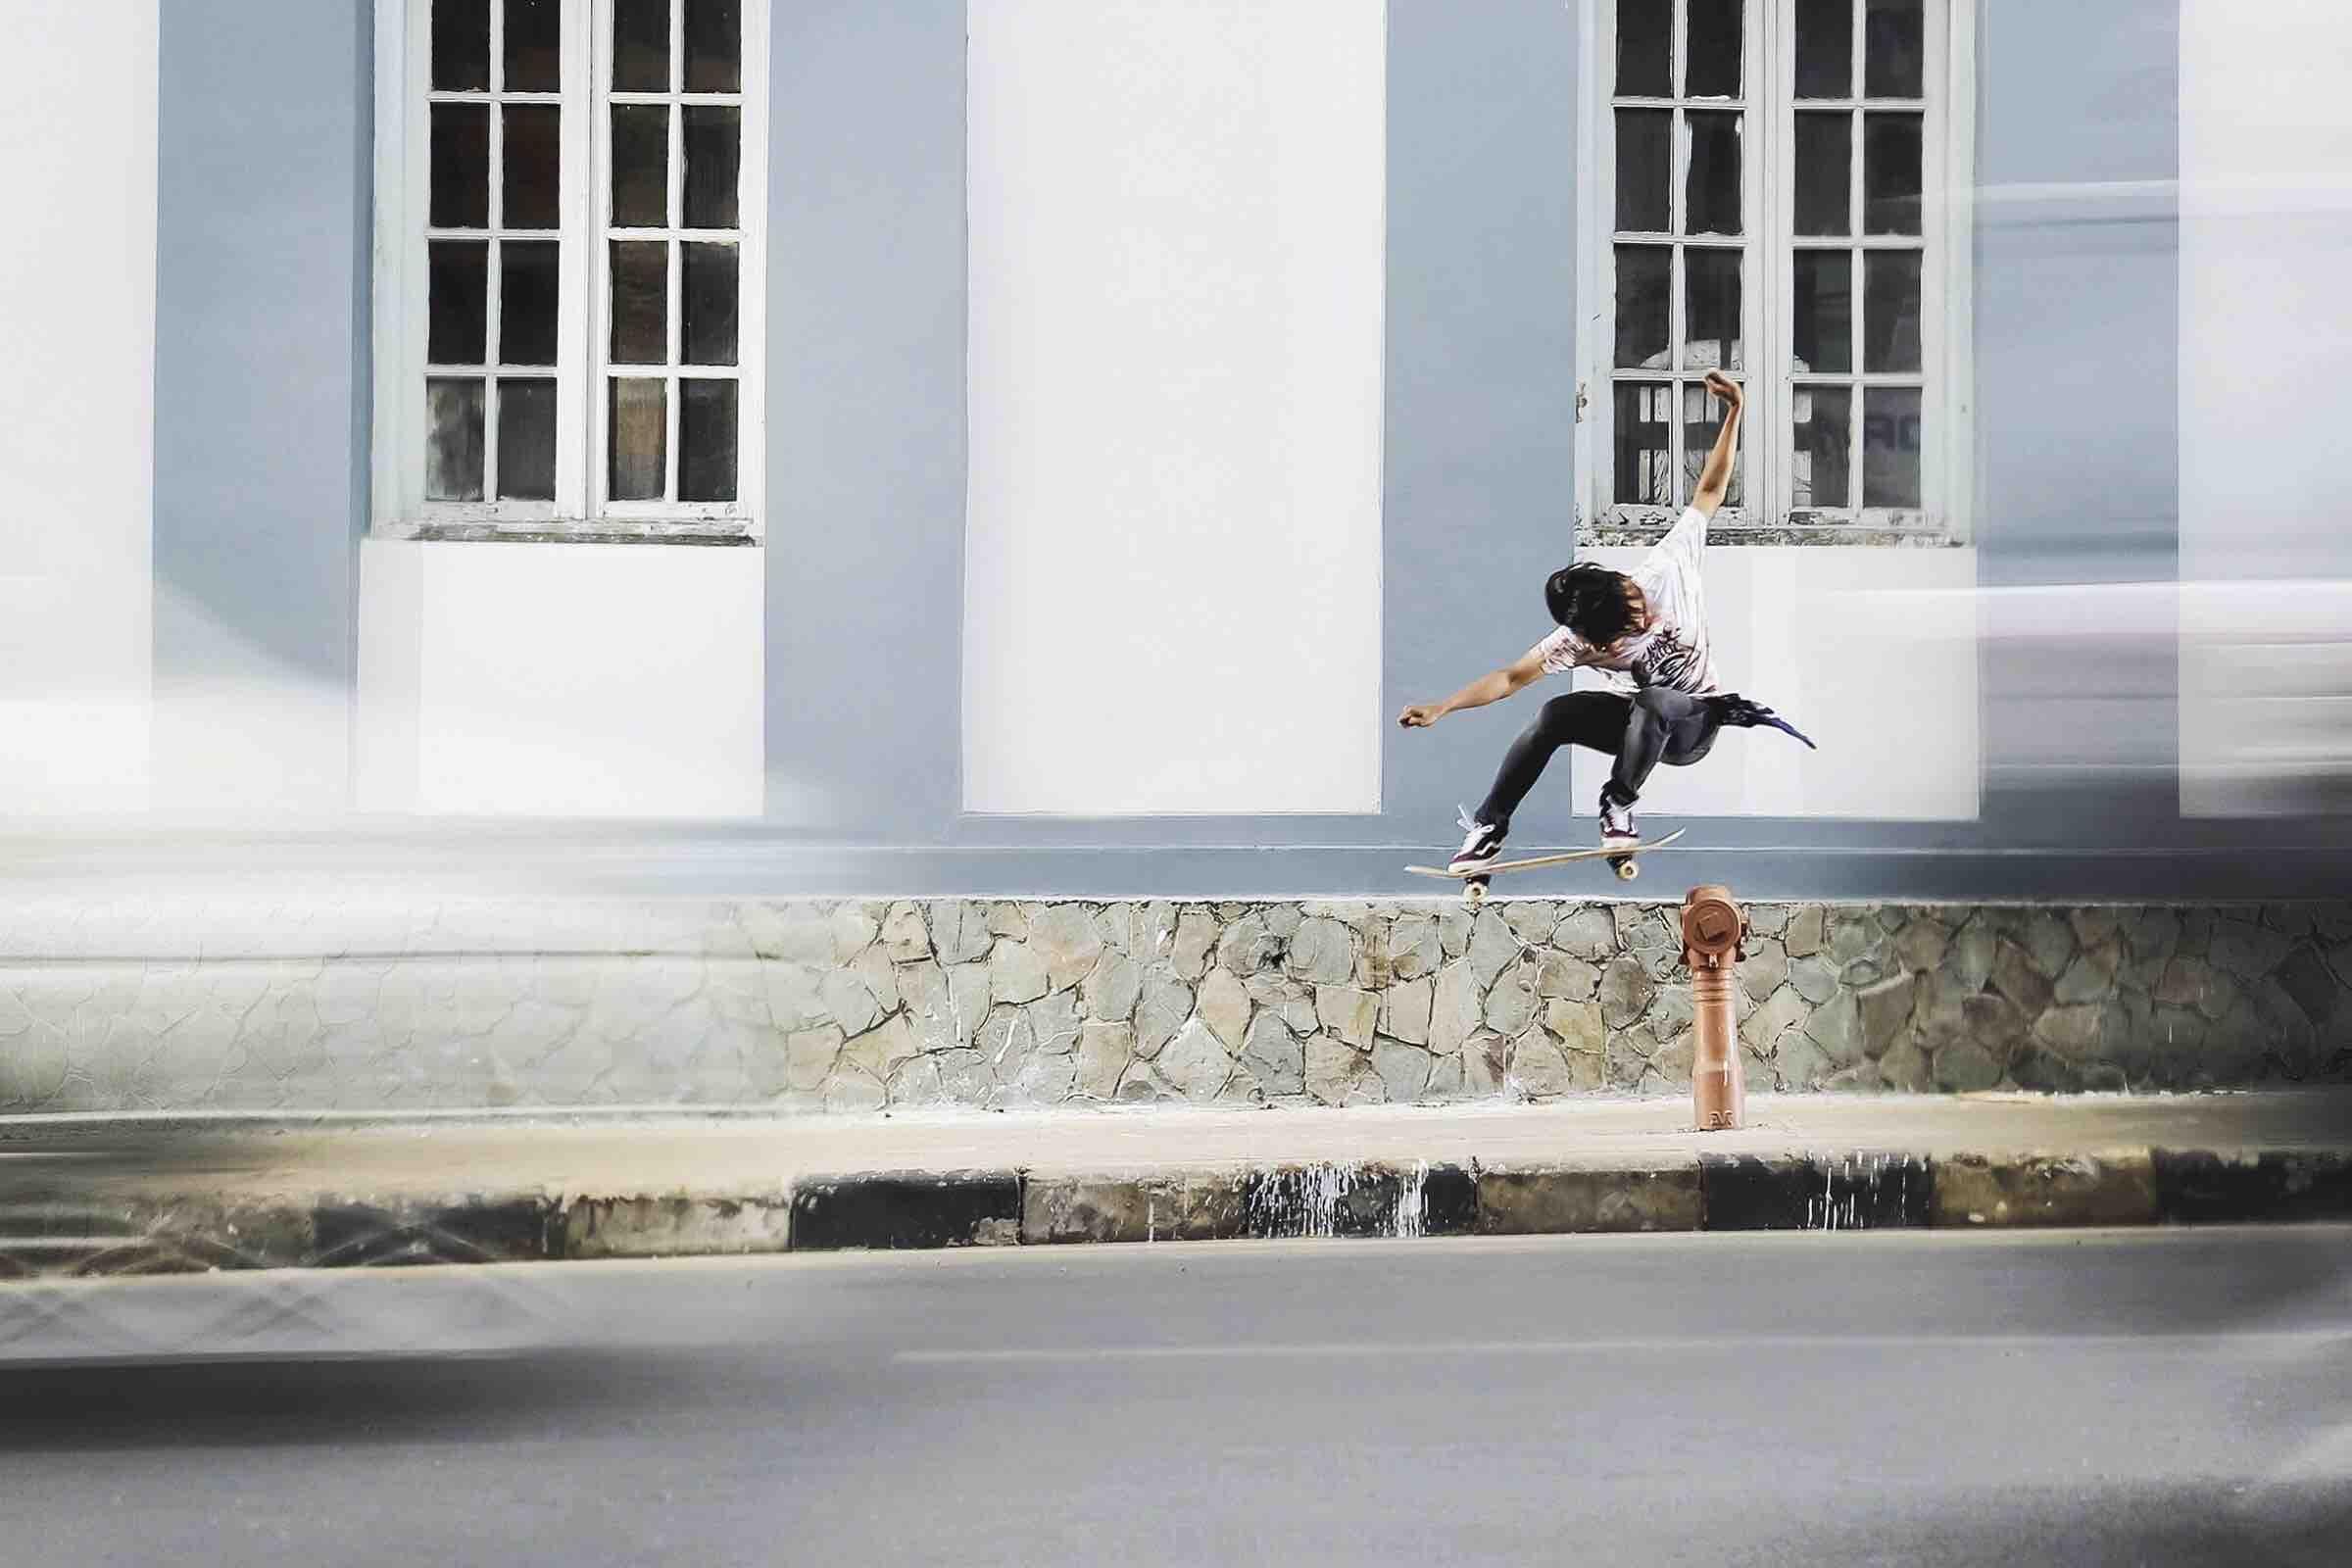 man jumping using skateboard